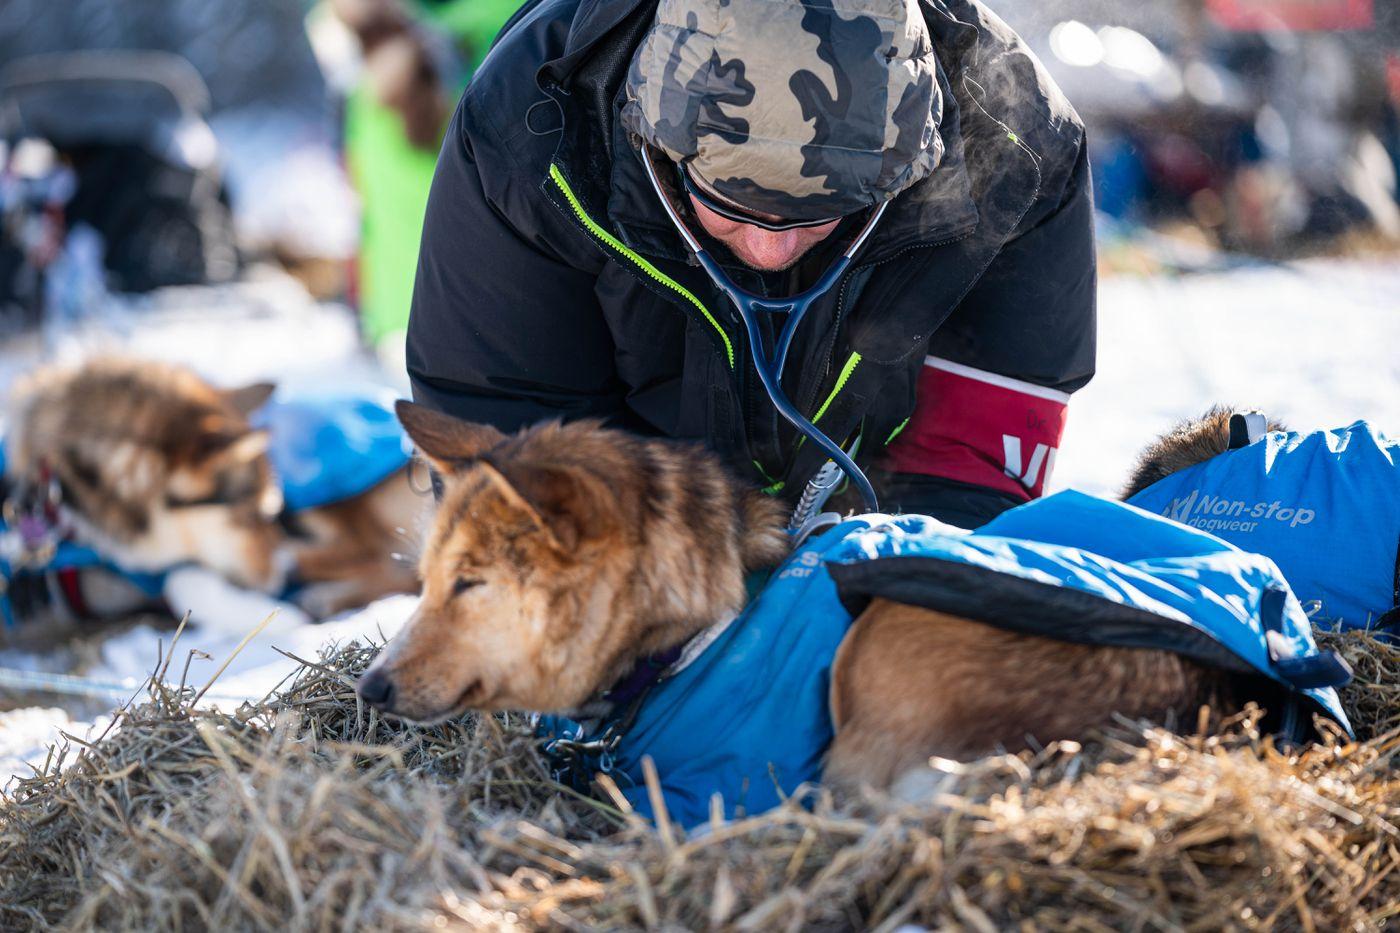 Gunnison, Colorado veterinarian Seth Nienhueser checks a dog in Michelle Phillips's team in Nikolai on Tuesday, March 10, 2020 during the Iditarod Trail Sled Dog Race. (Loren Holmes / ADN)